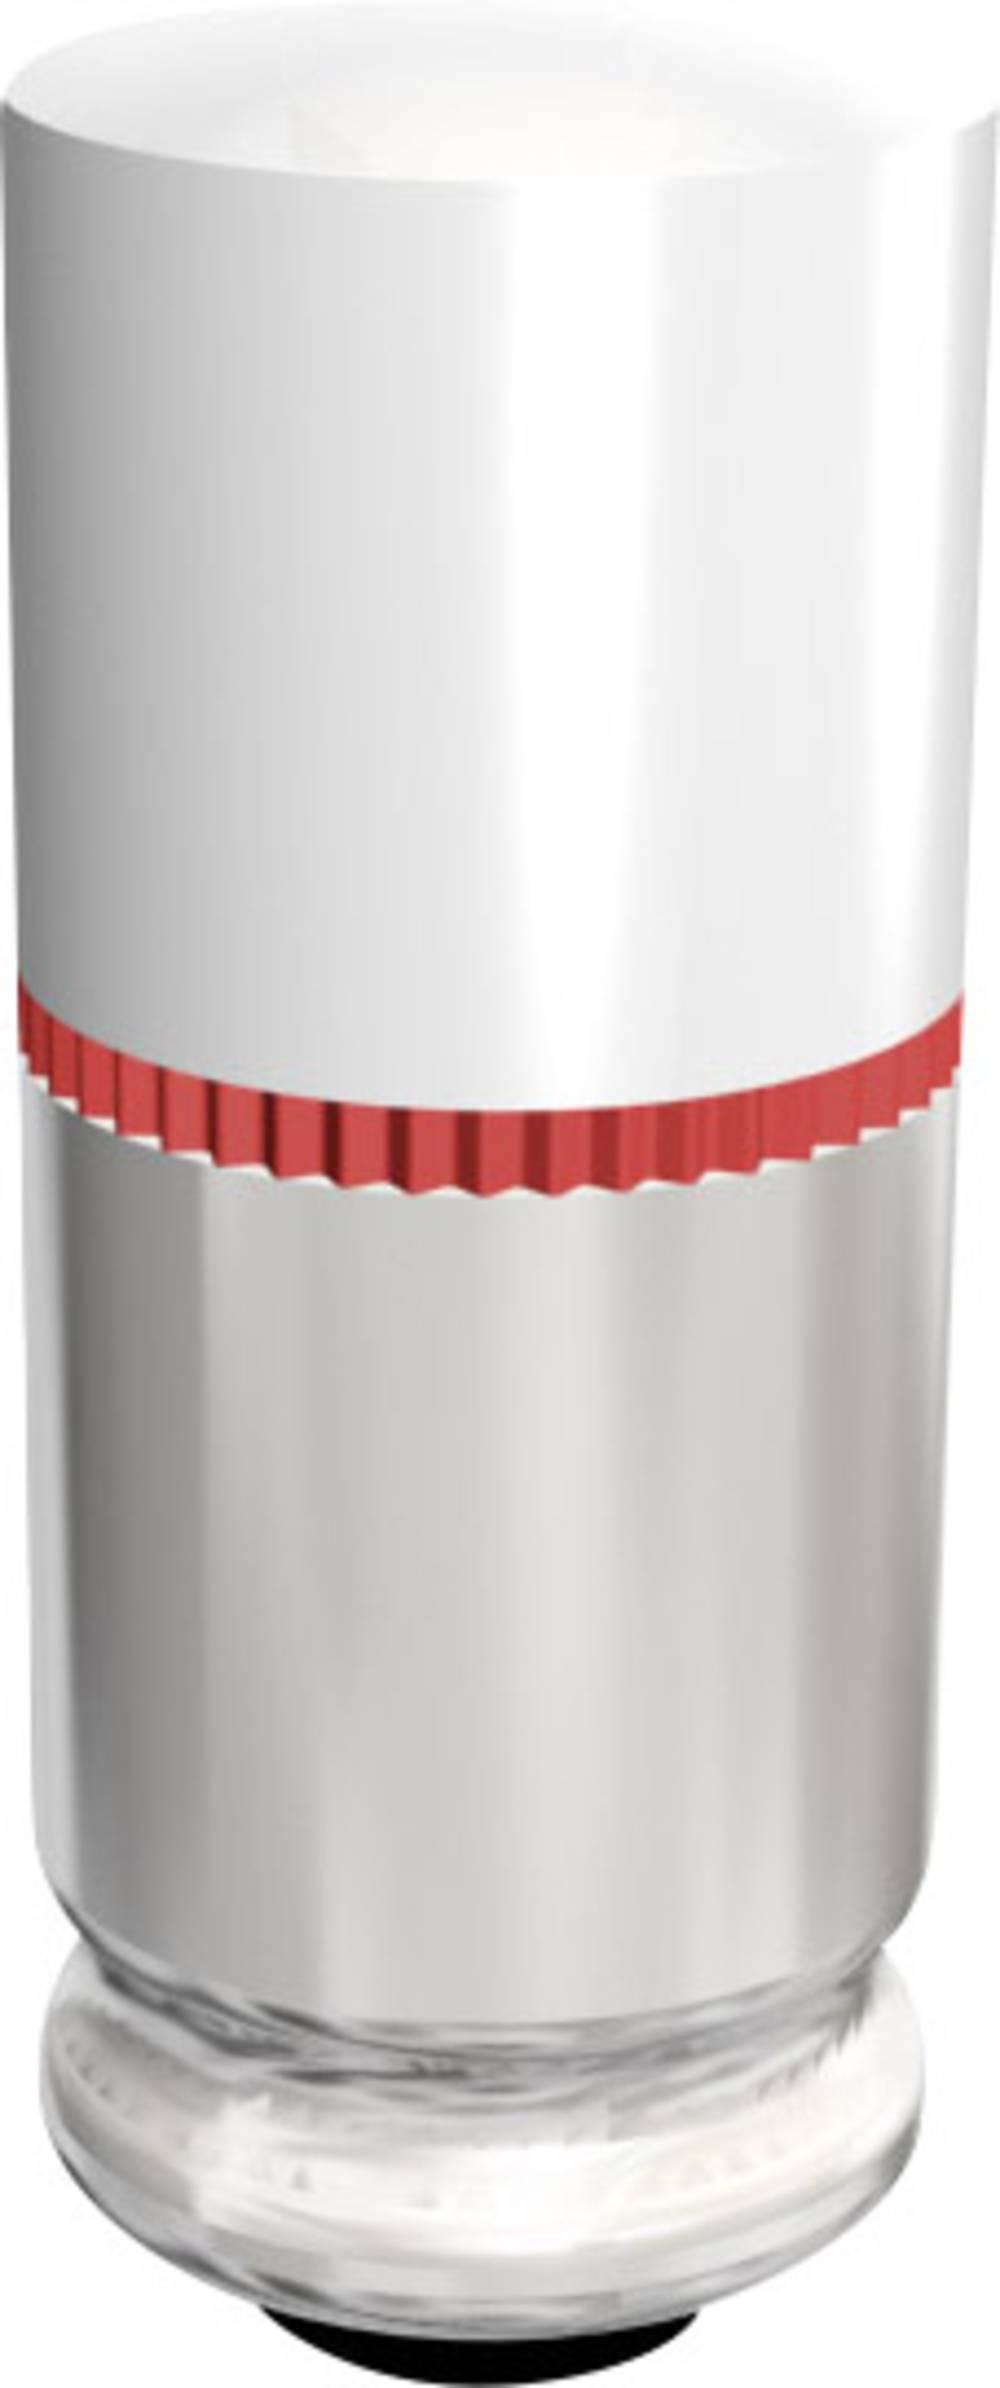 LED žarnica MG5.7 ultra zelena 24 V/DC, 24 V/AC Signal Construct MWCG5774